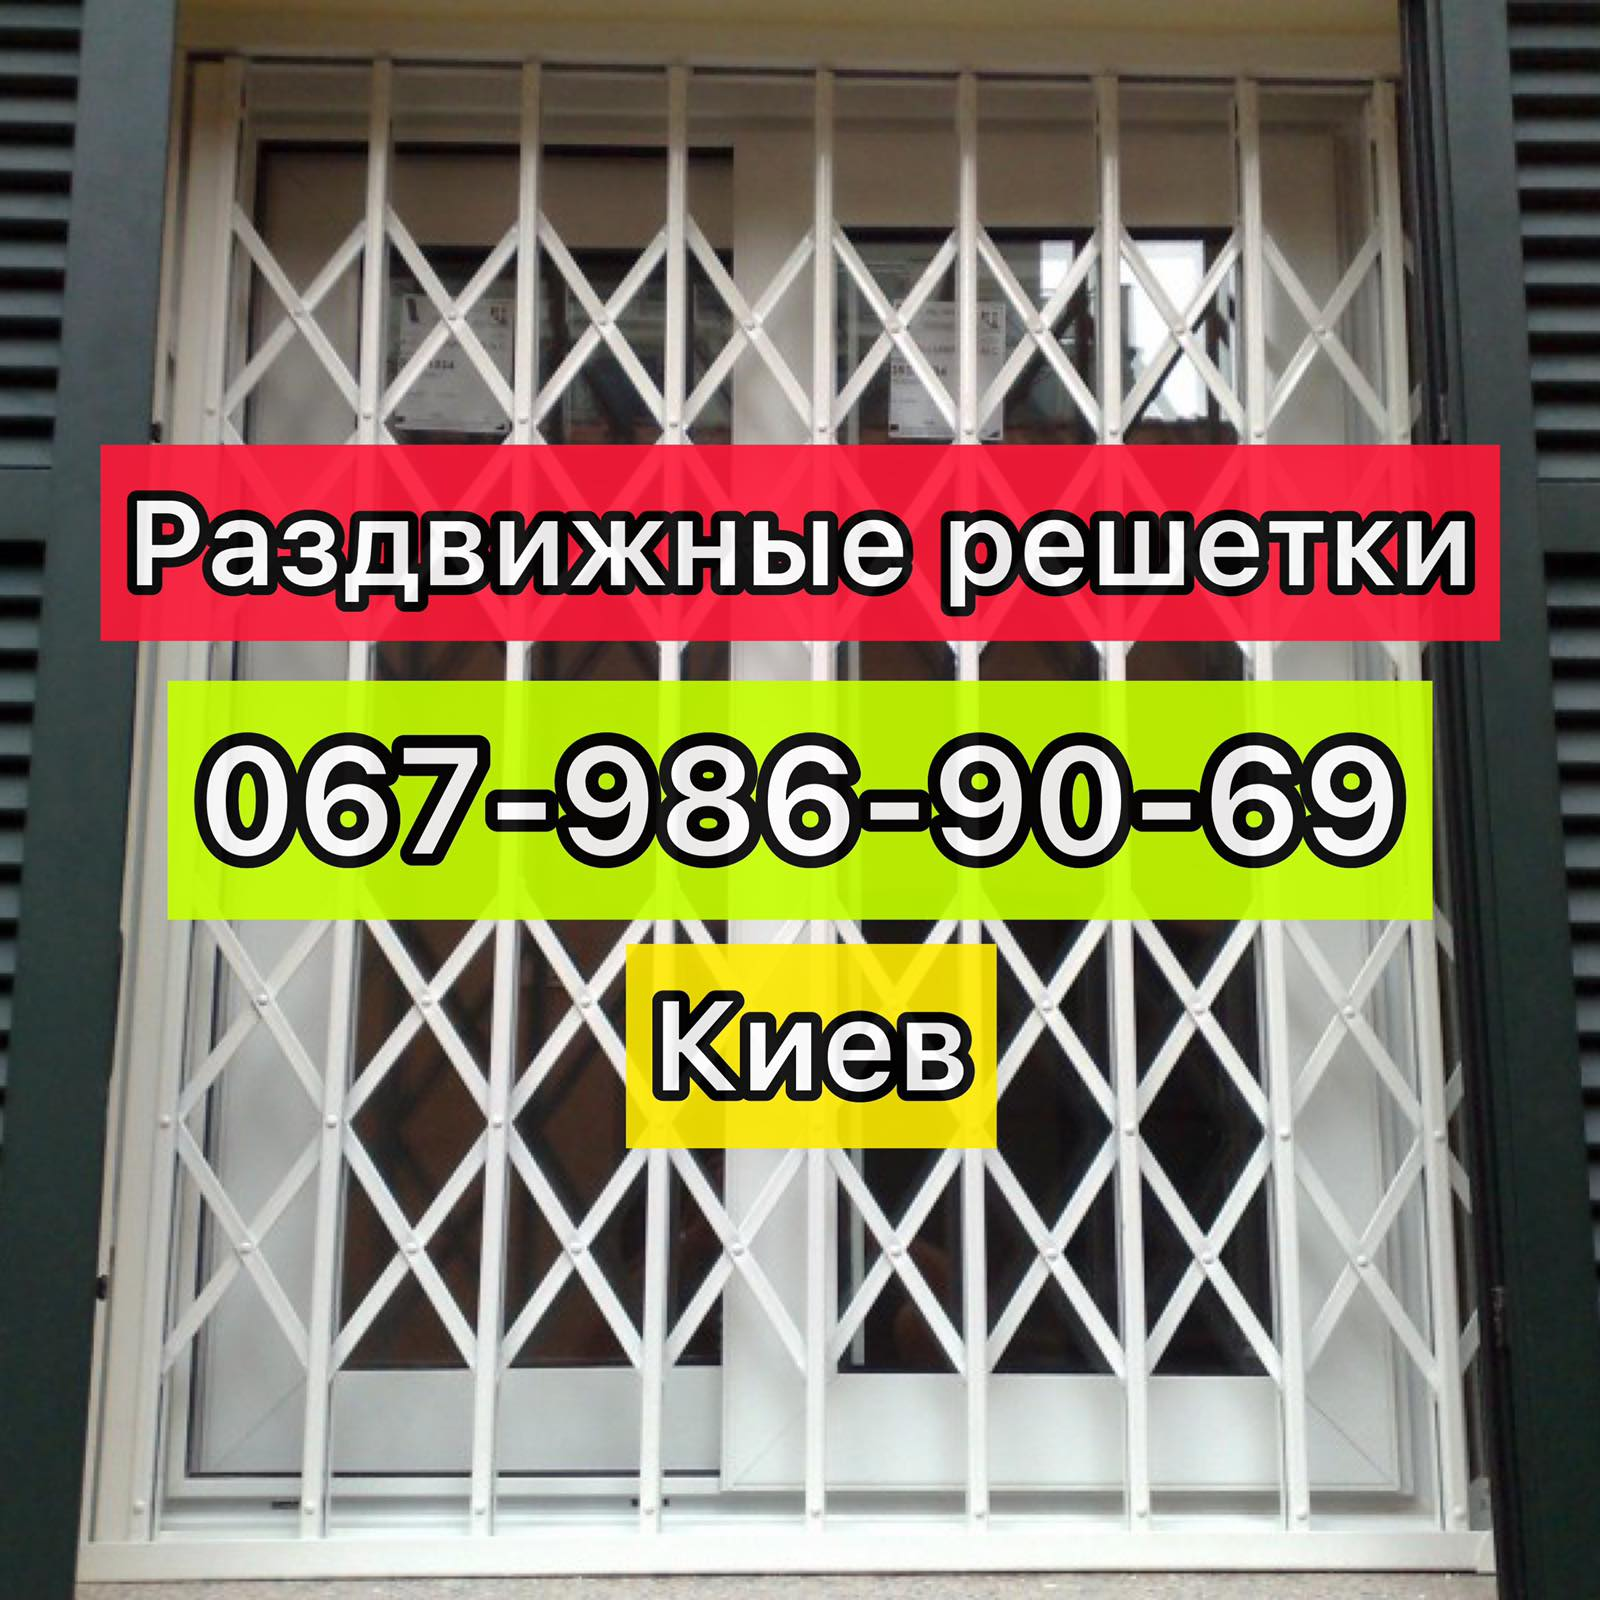 Раздвижные решетки металлические на окна, двери